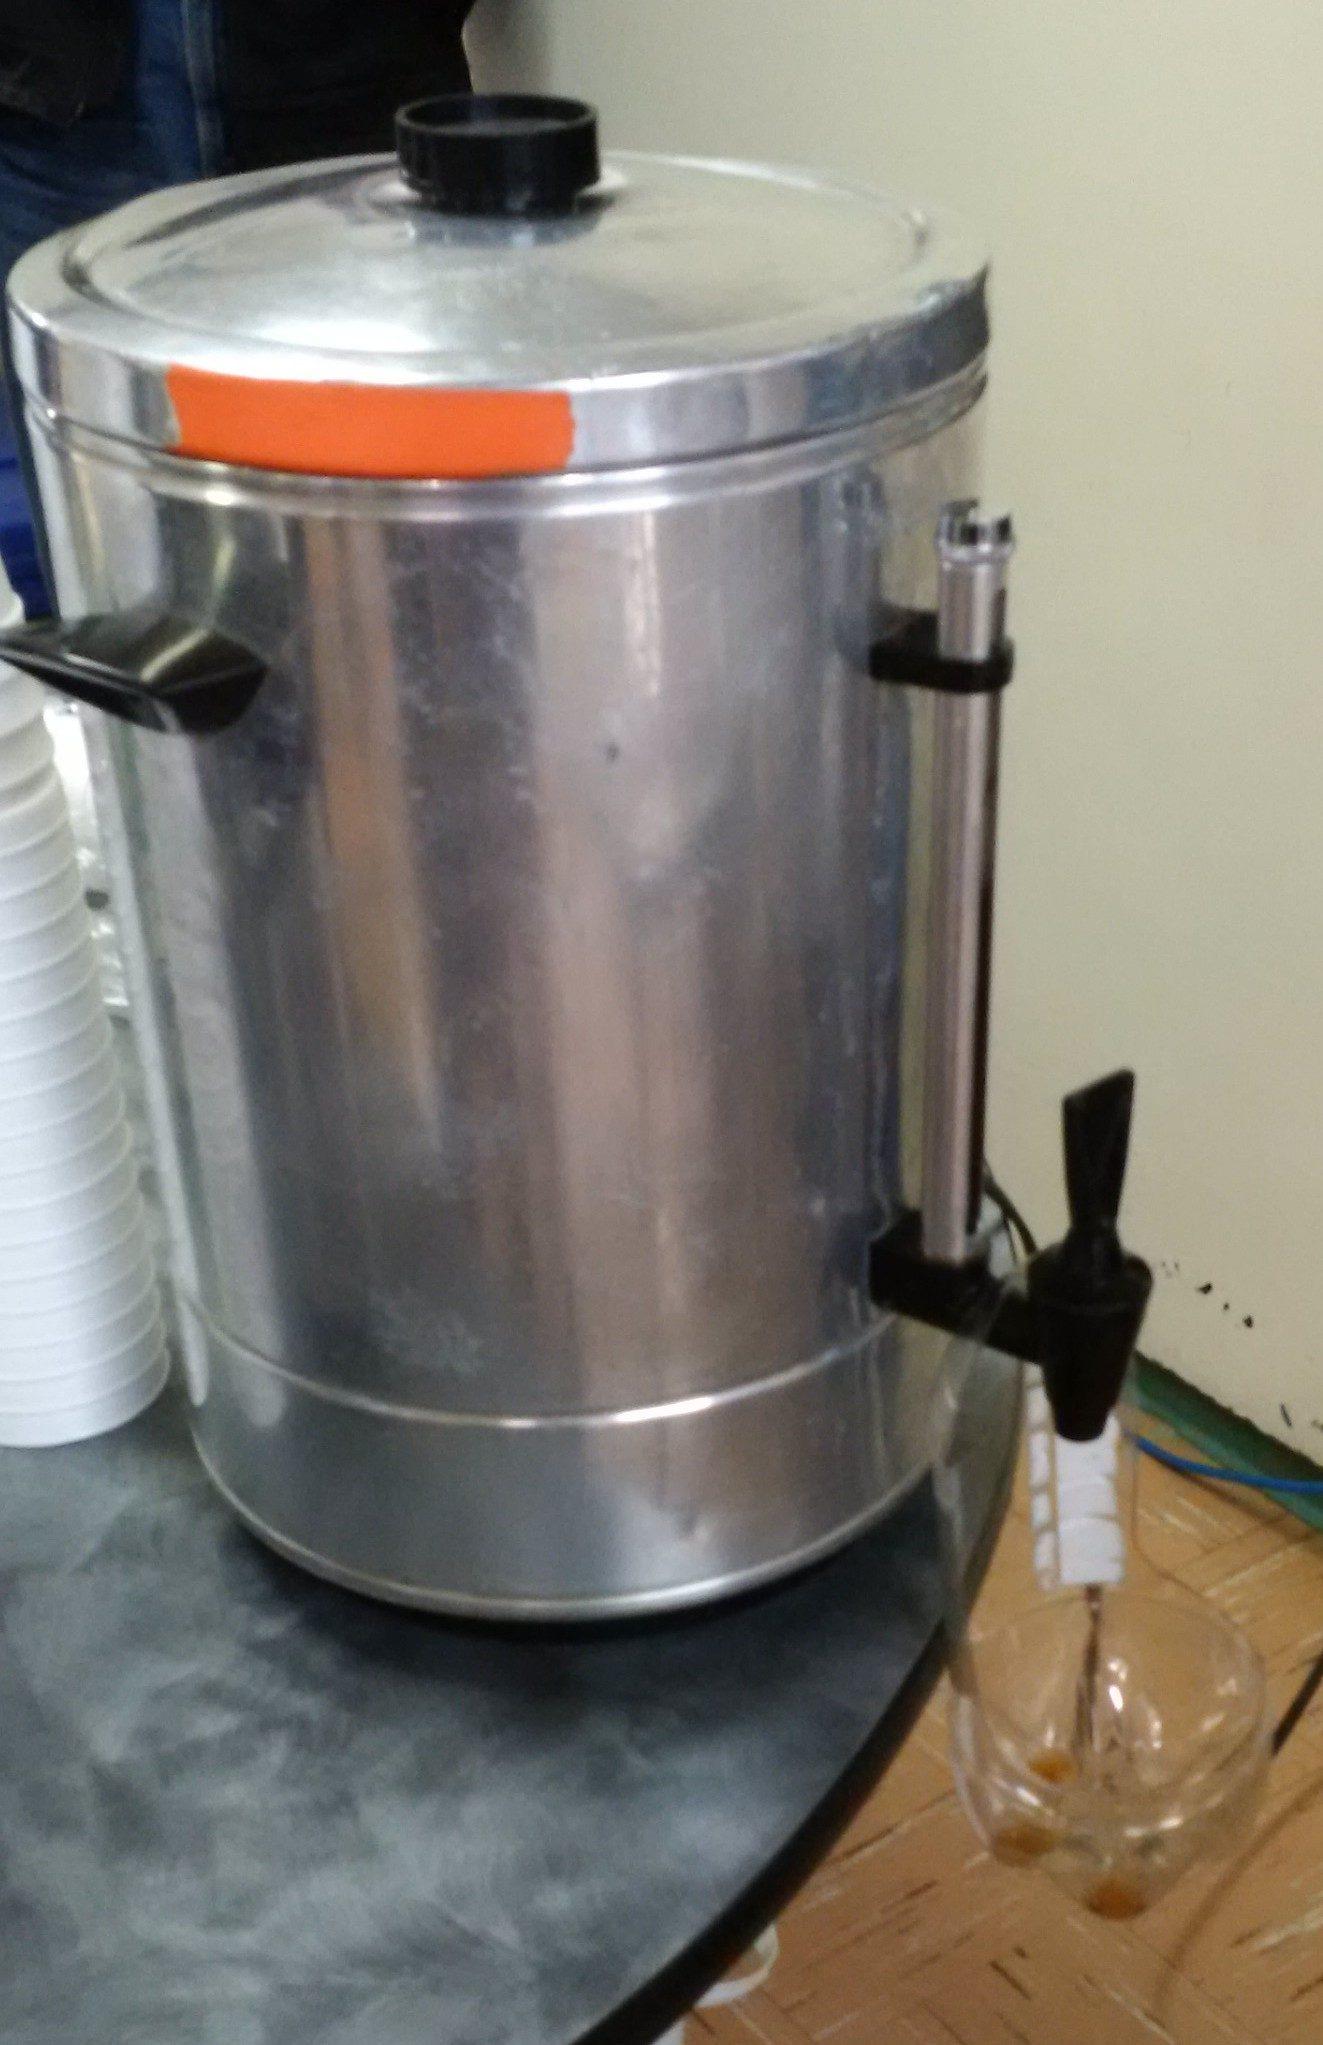 Drip stop on coffee urn